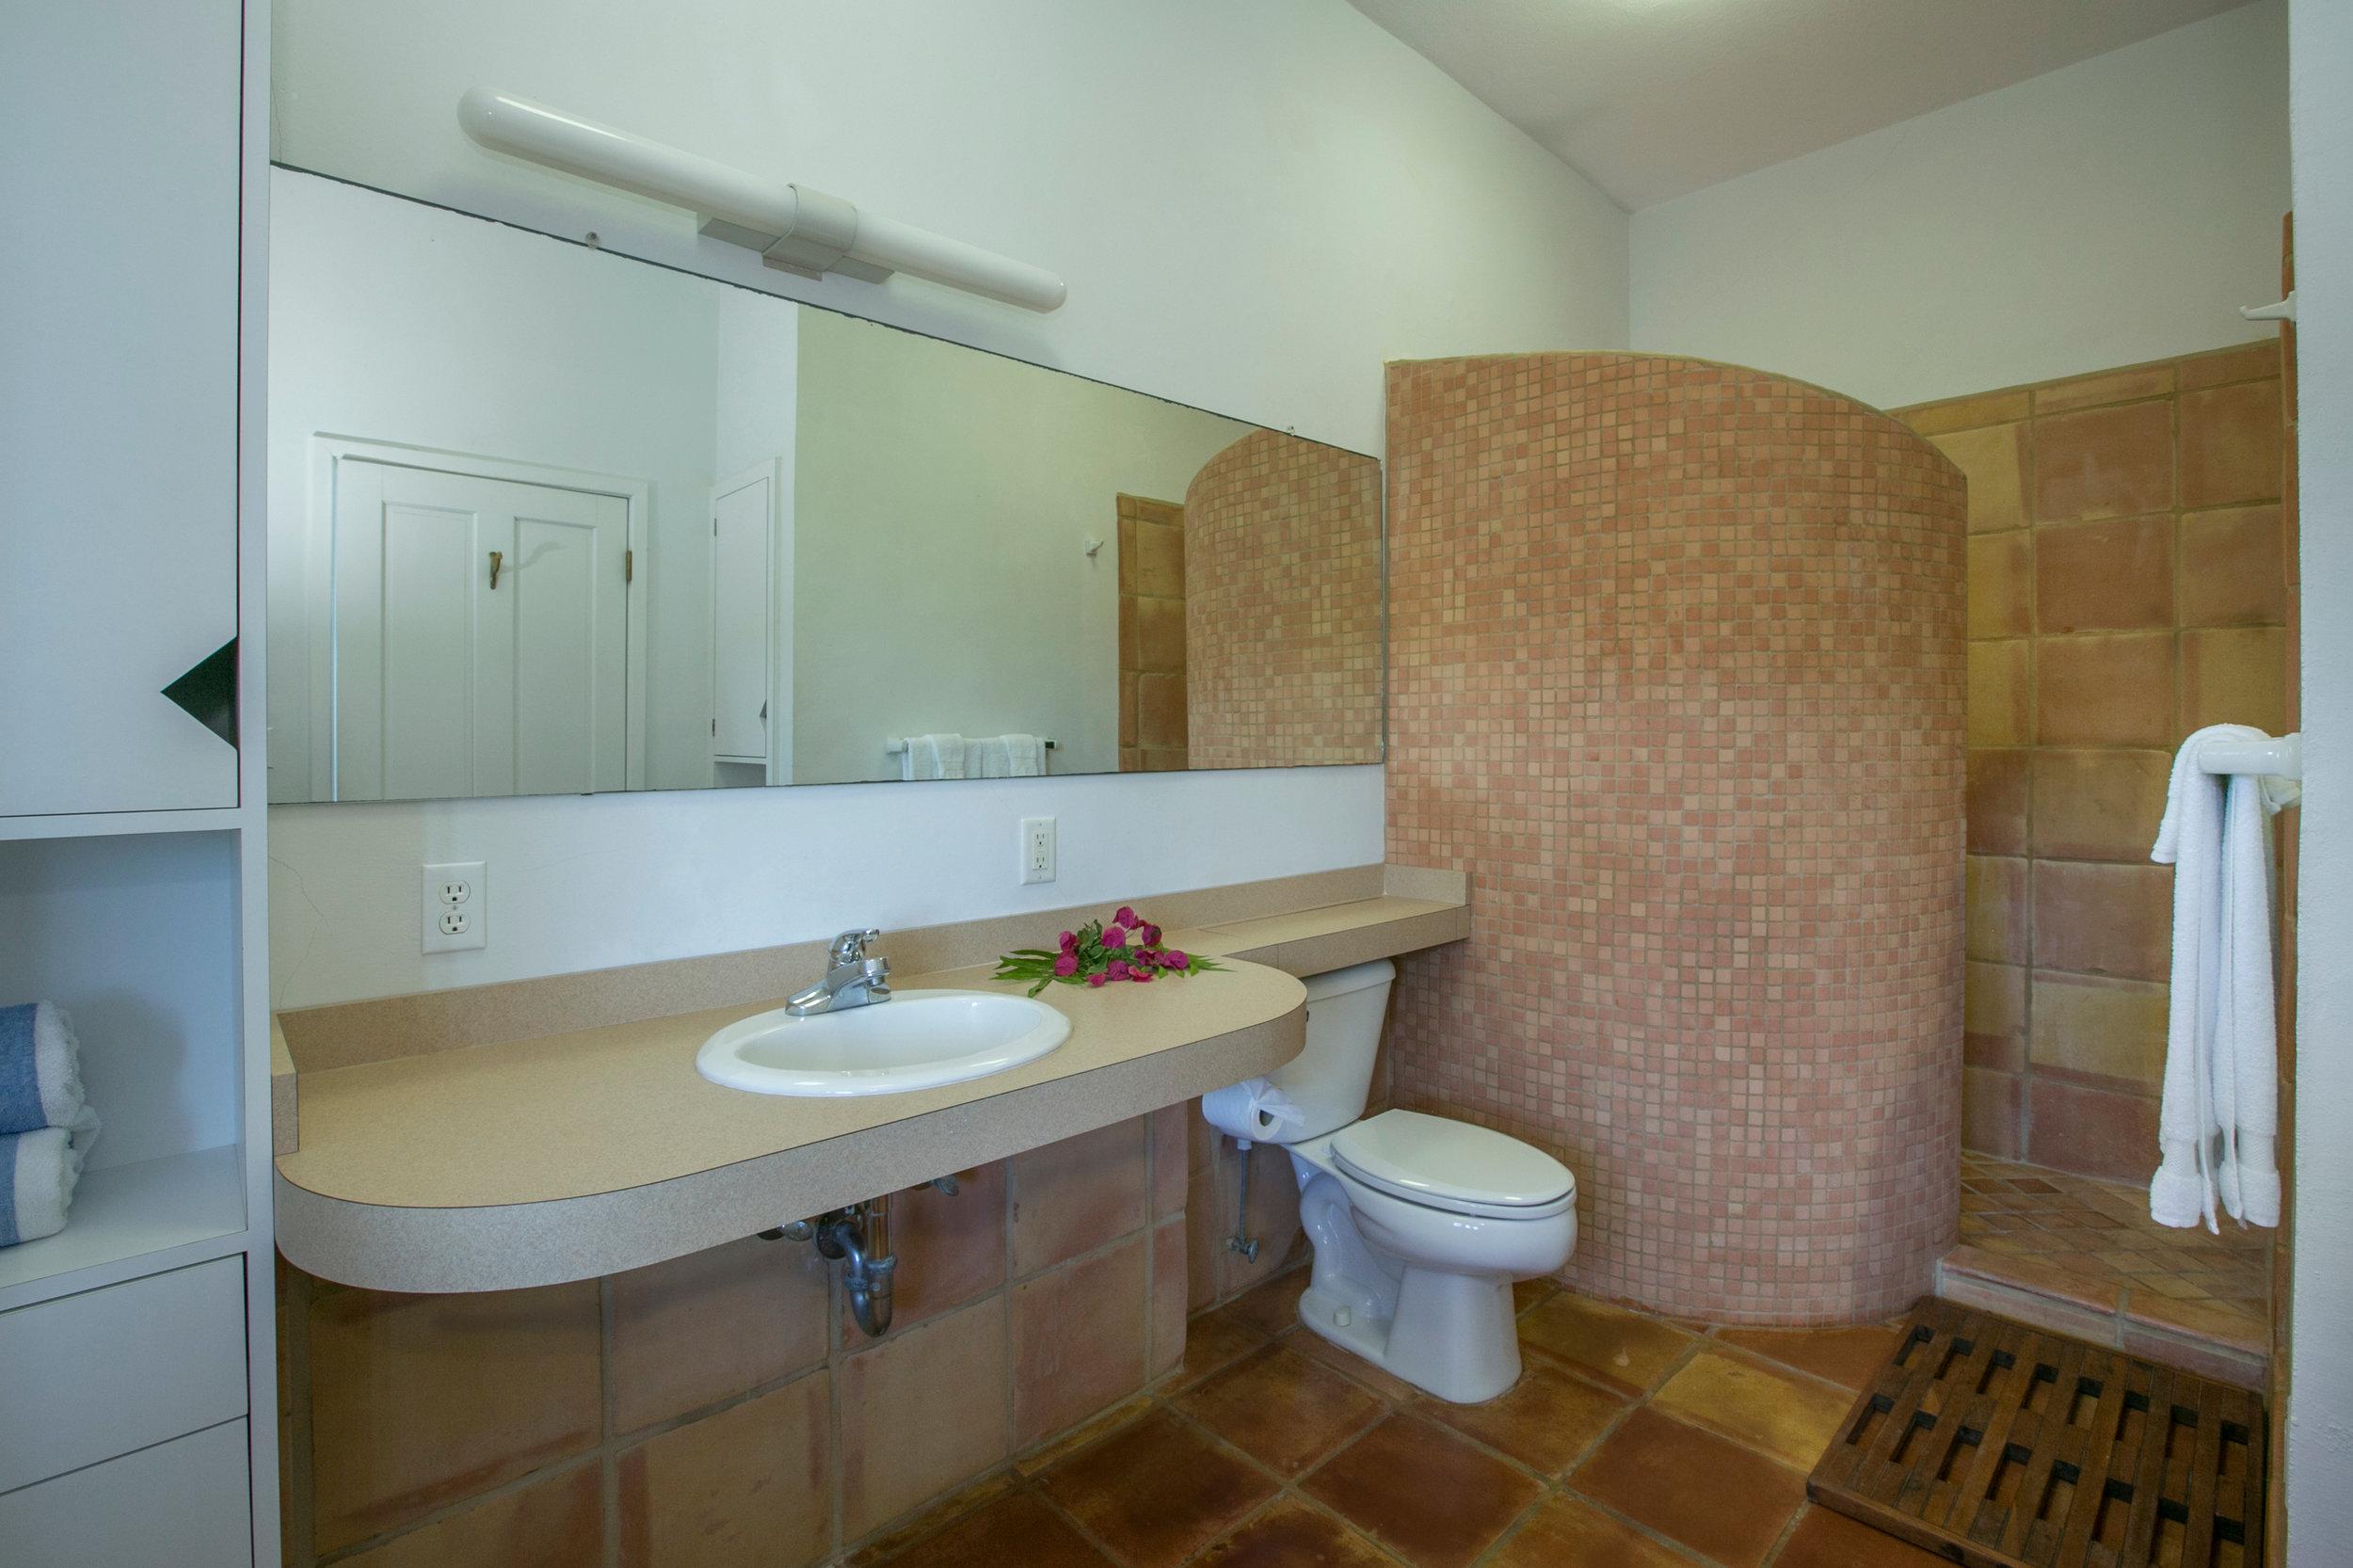 drakesview_white-bed-room-bath-5D3B5524-HDR.jpg